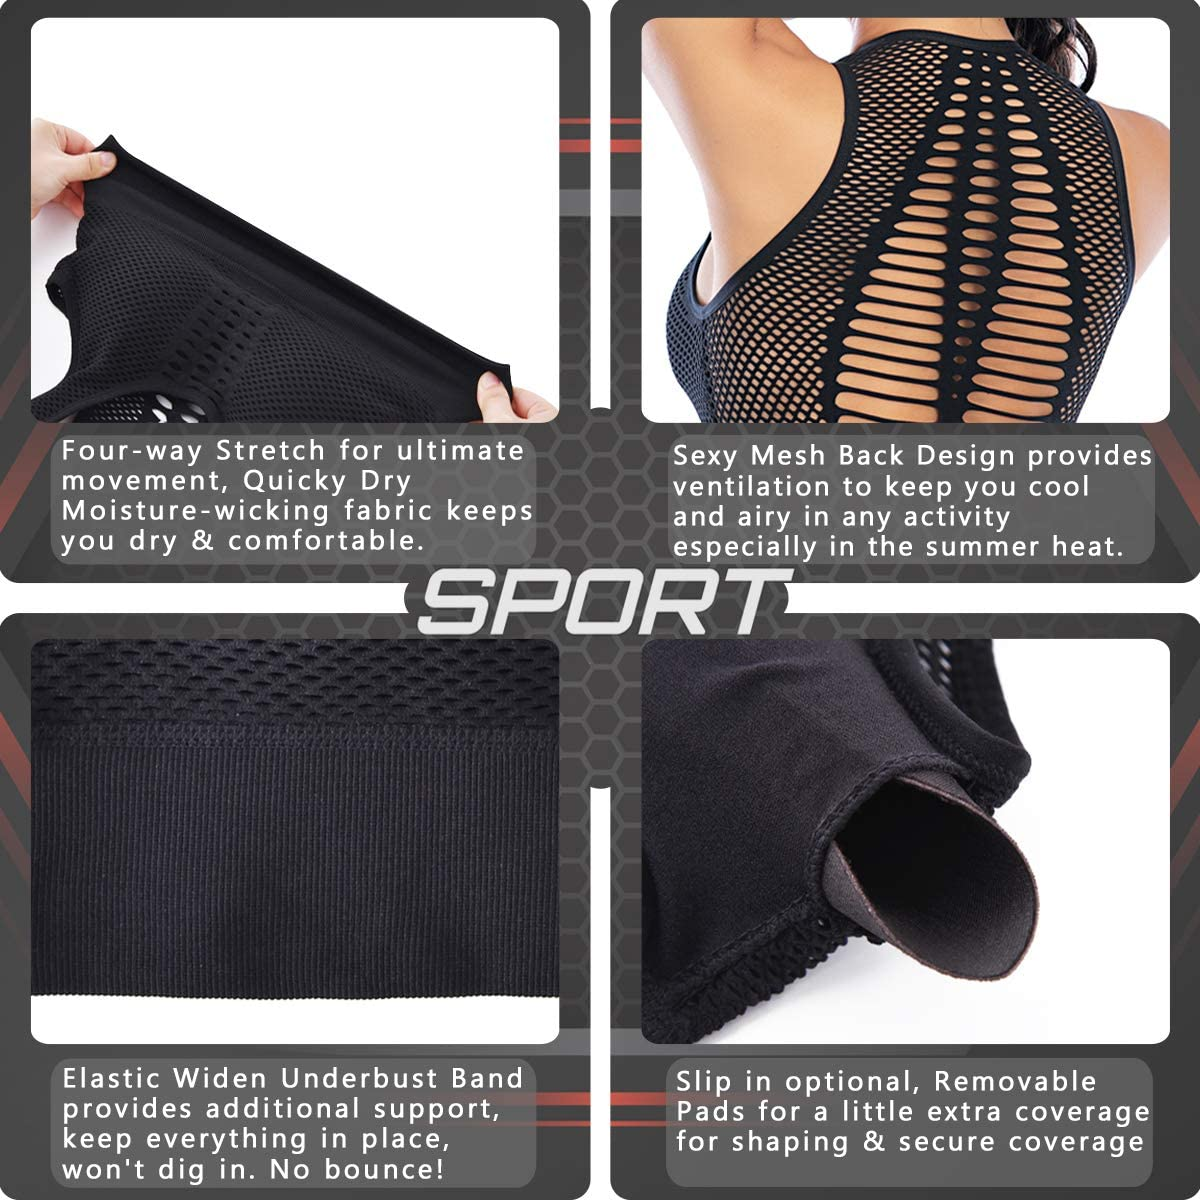 Cordaw Longline Sports Bra for Women High Impact Gym Workout Bras Racerback Padded Crop Tops Activewear